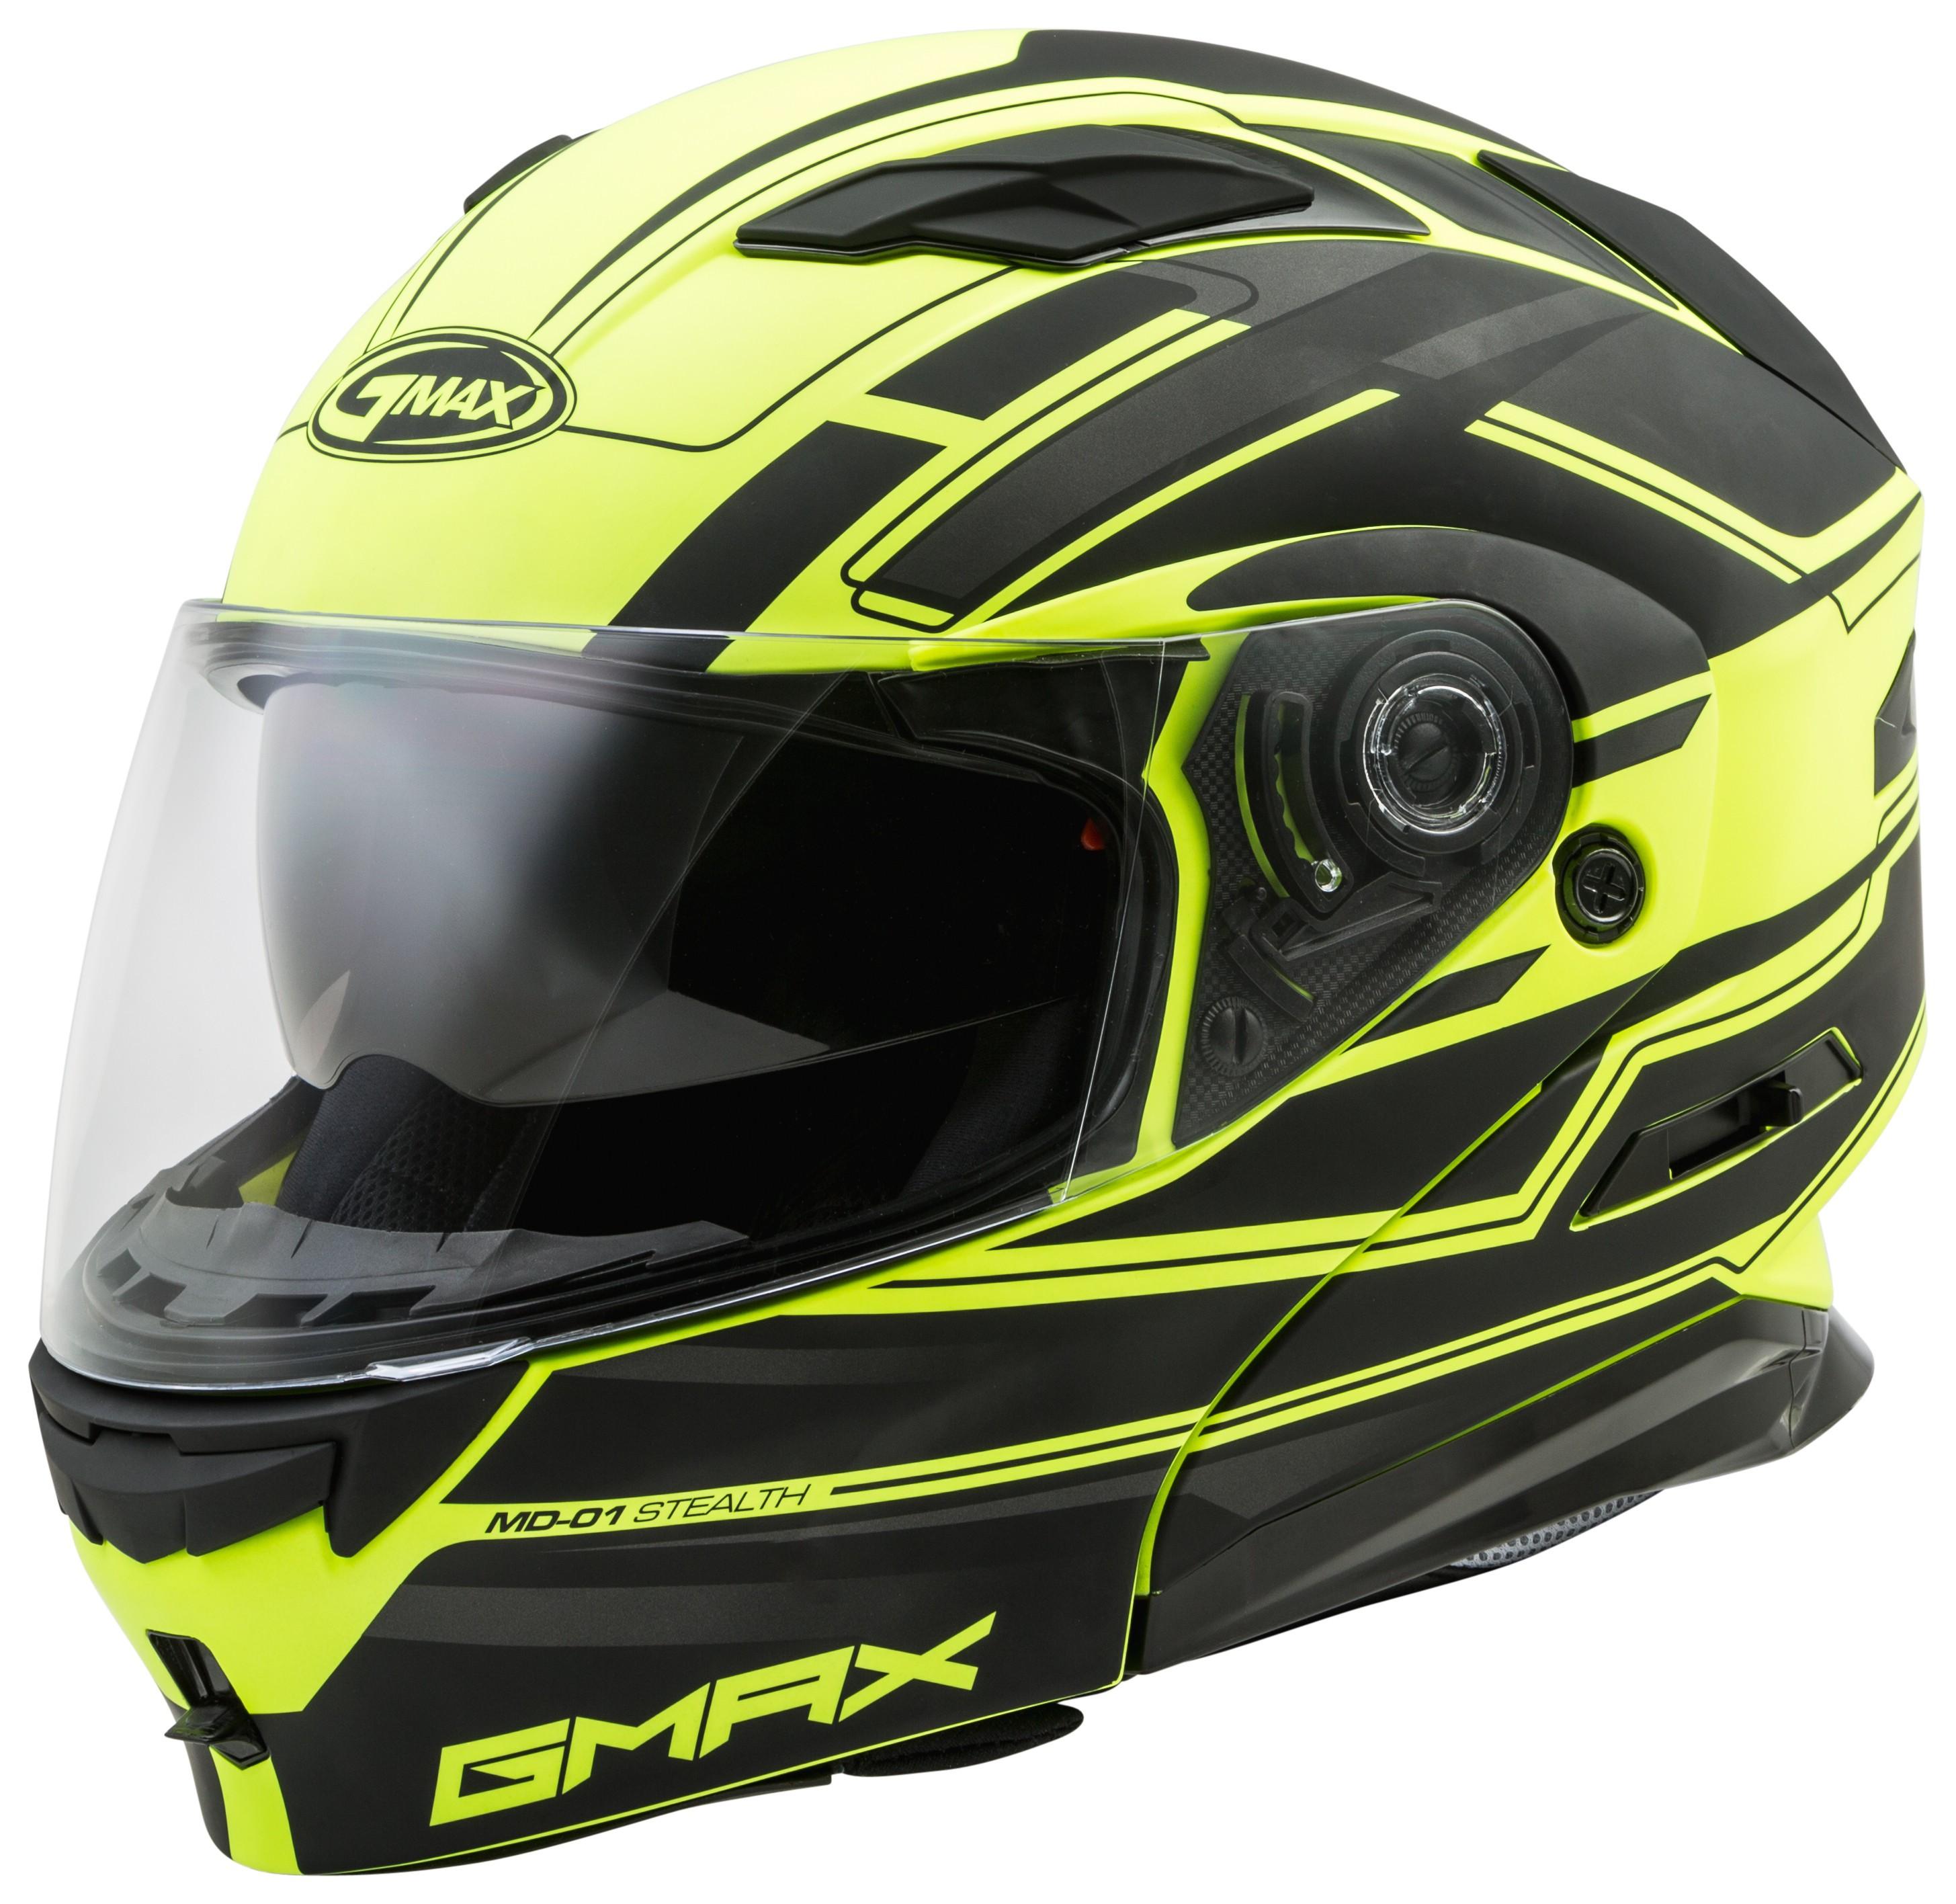 g_max_md01_stealth_helmet.jpg